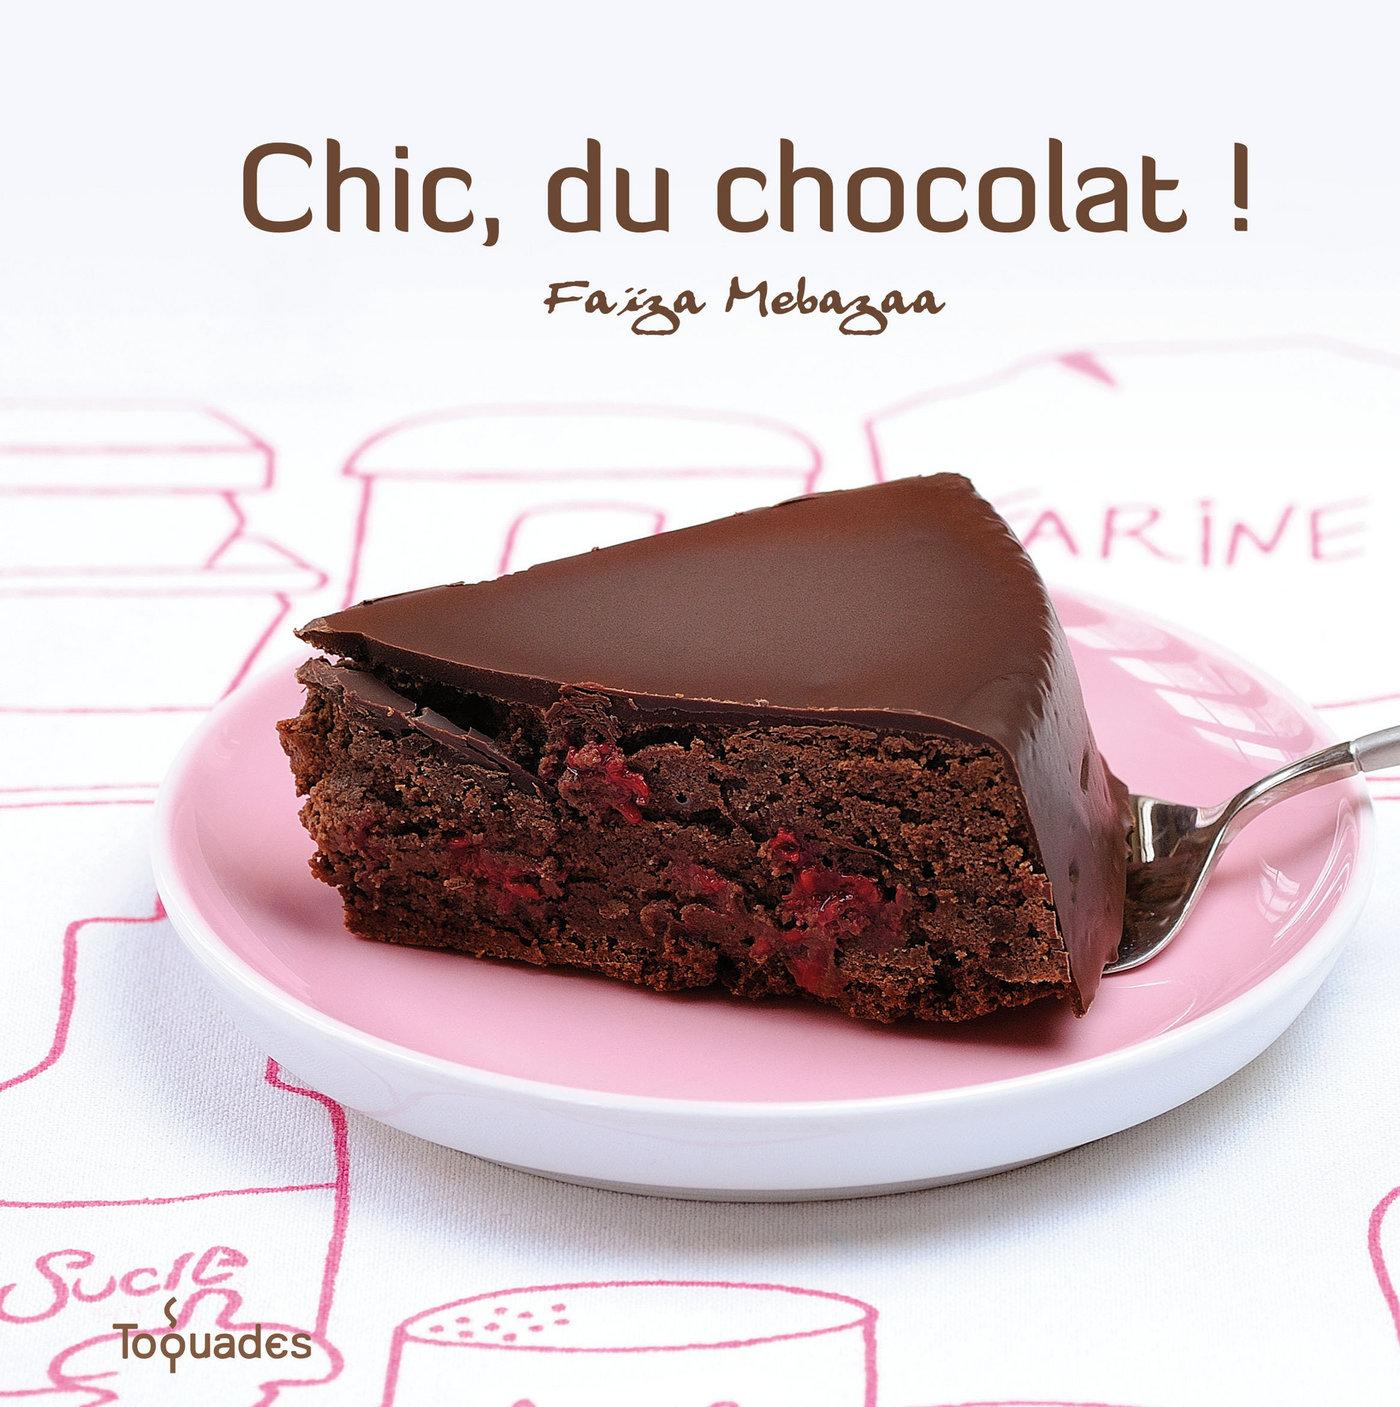 Chic, du chocolat !